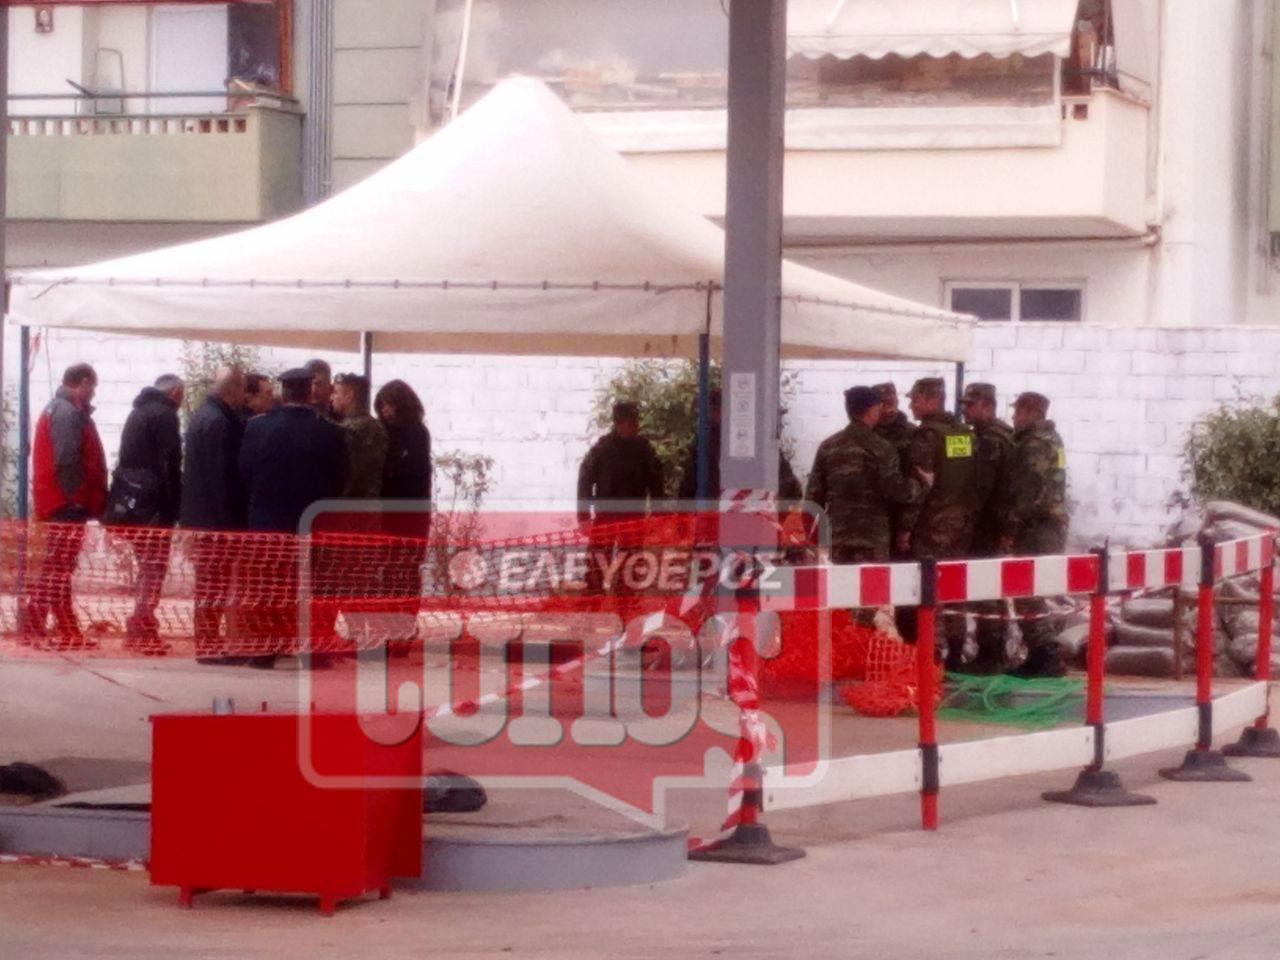 purotexnourgoi-vomva-4 Λήξη συναγερμού στο Κορδελιό - Επιστρέφουν οι κάτοικοι